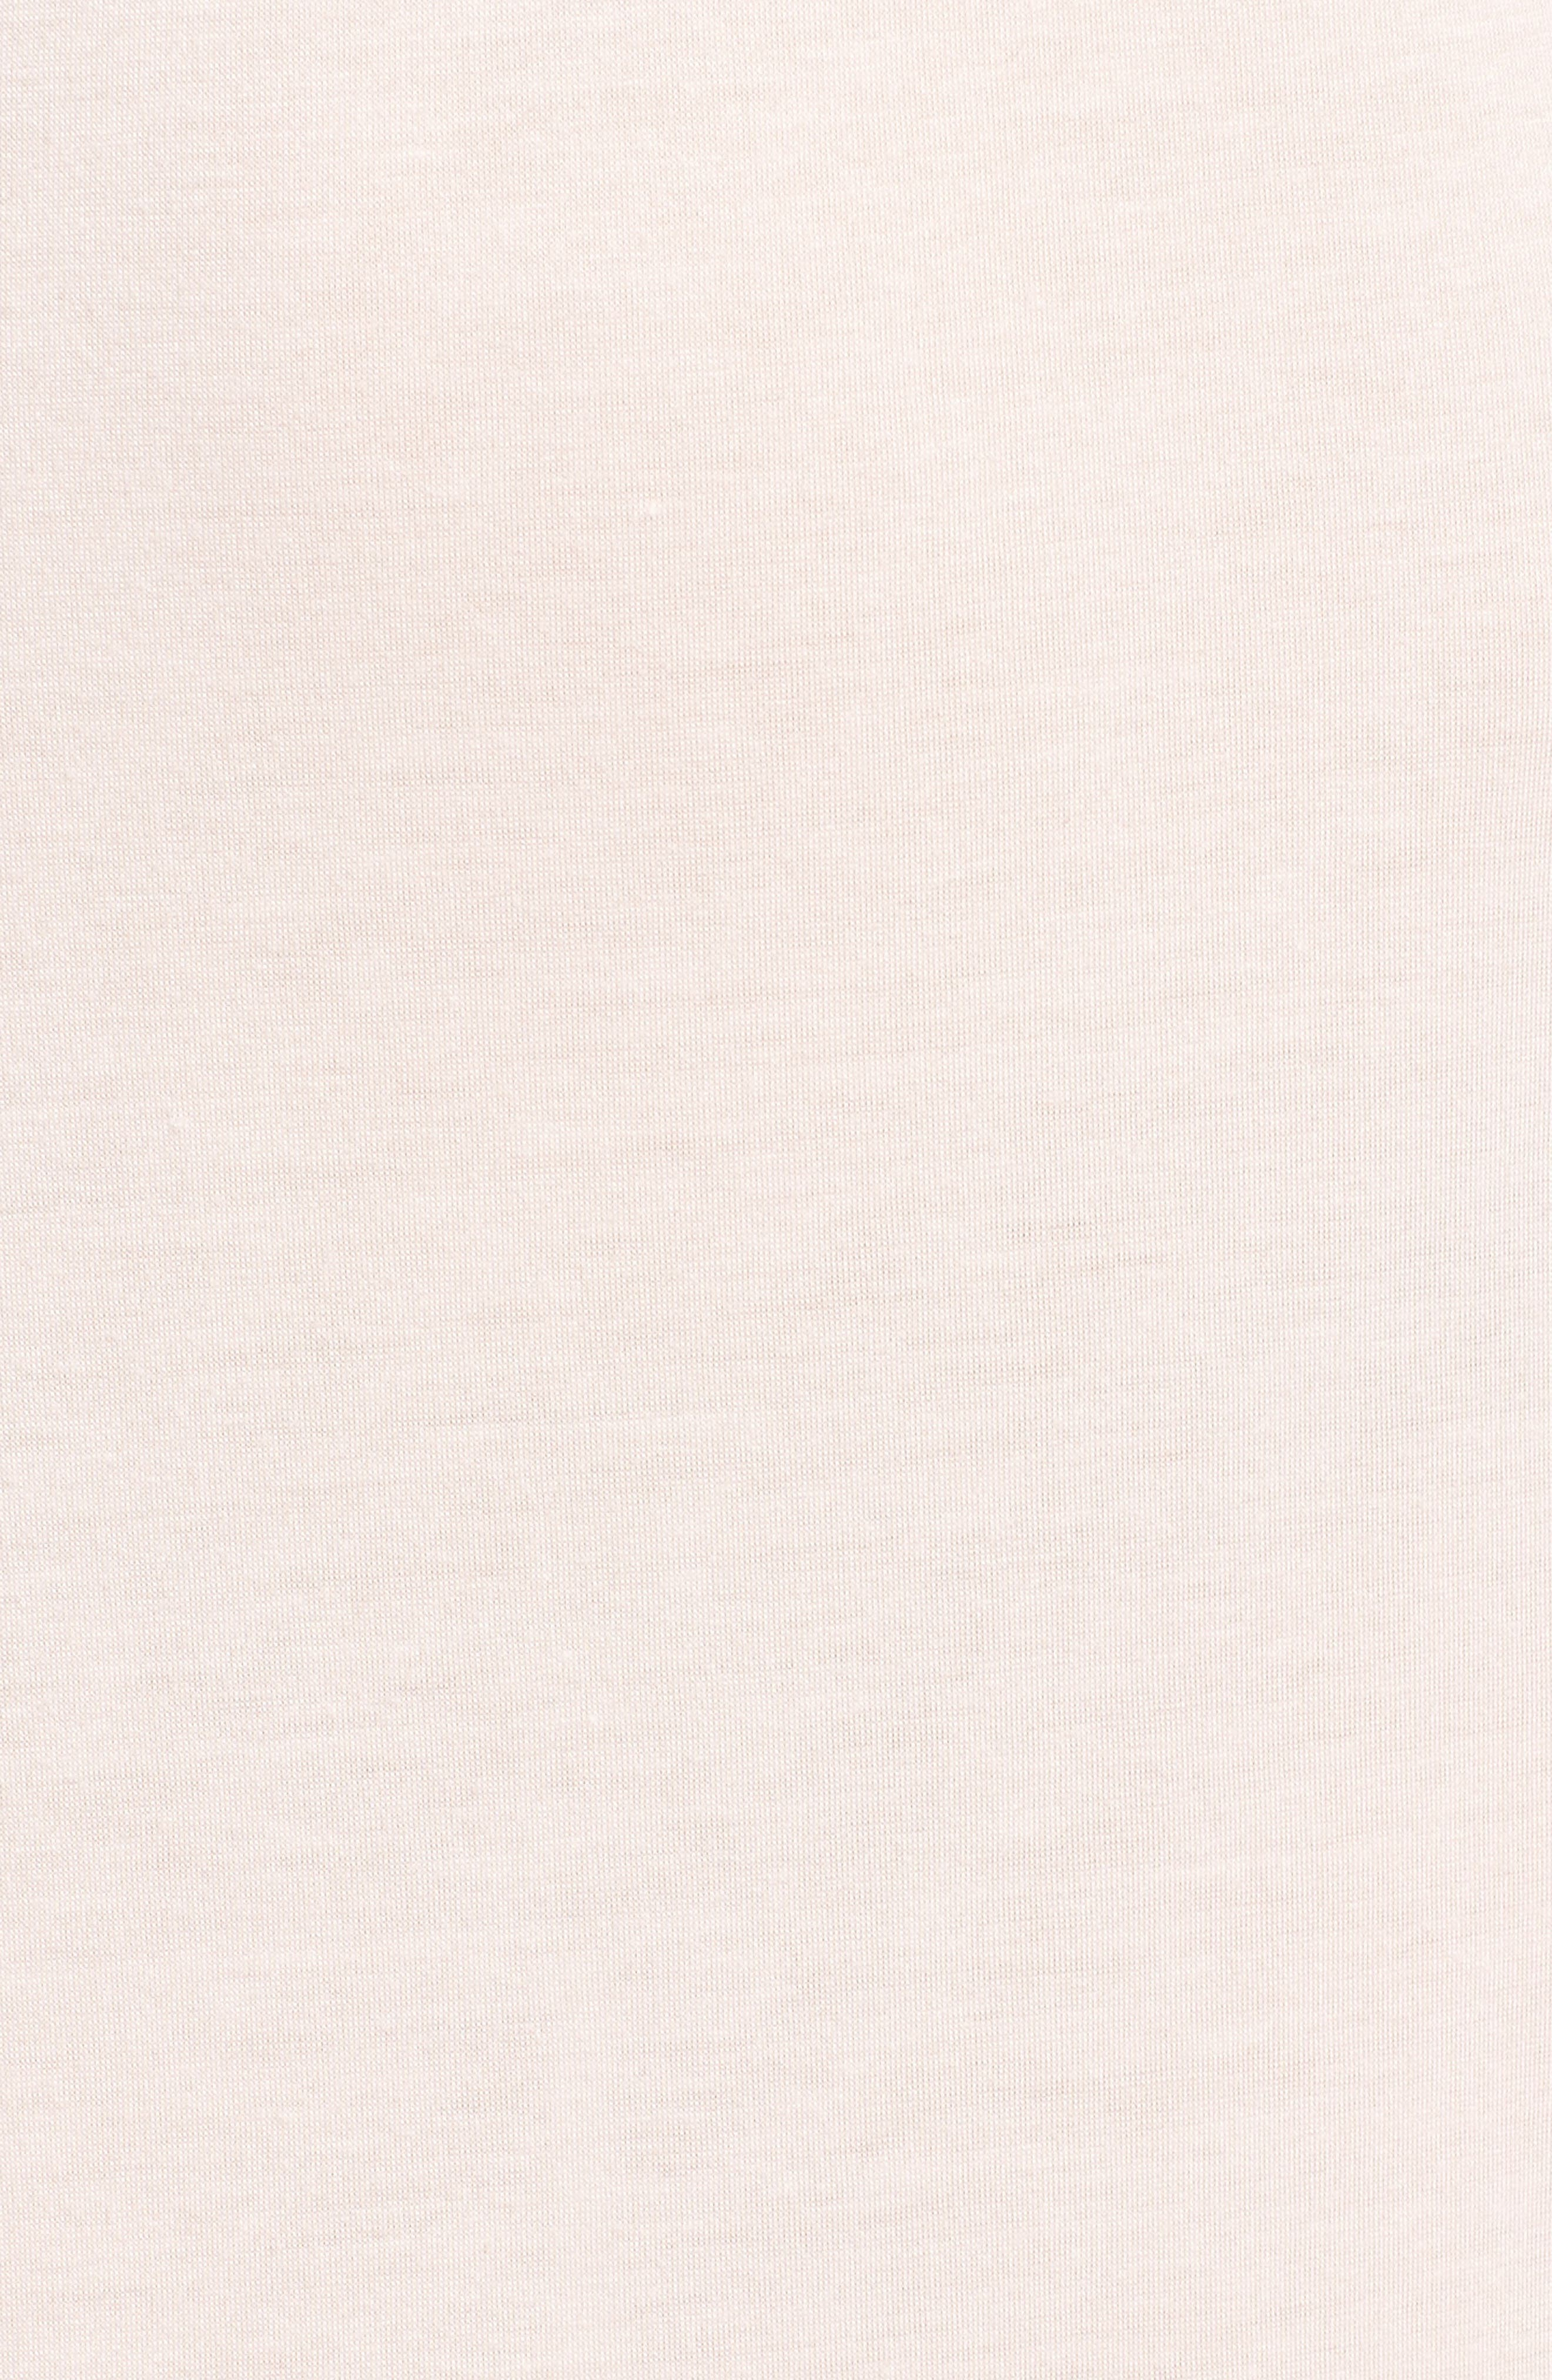 Luxe Shangri-La Nightgown,                             Alternate thumbnail 6, color,                             Blush Pink